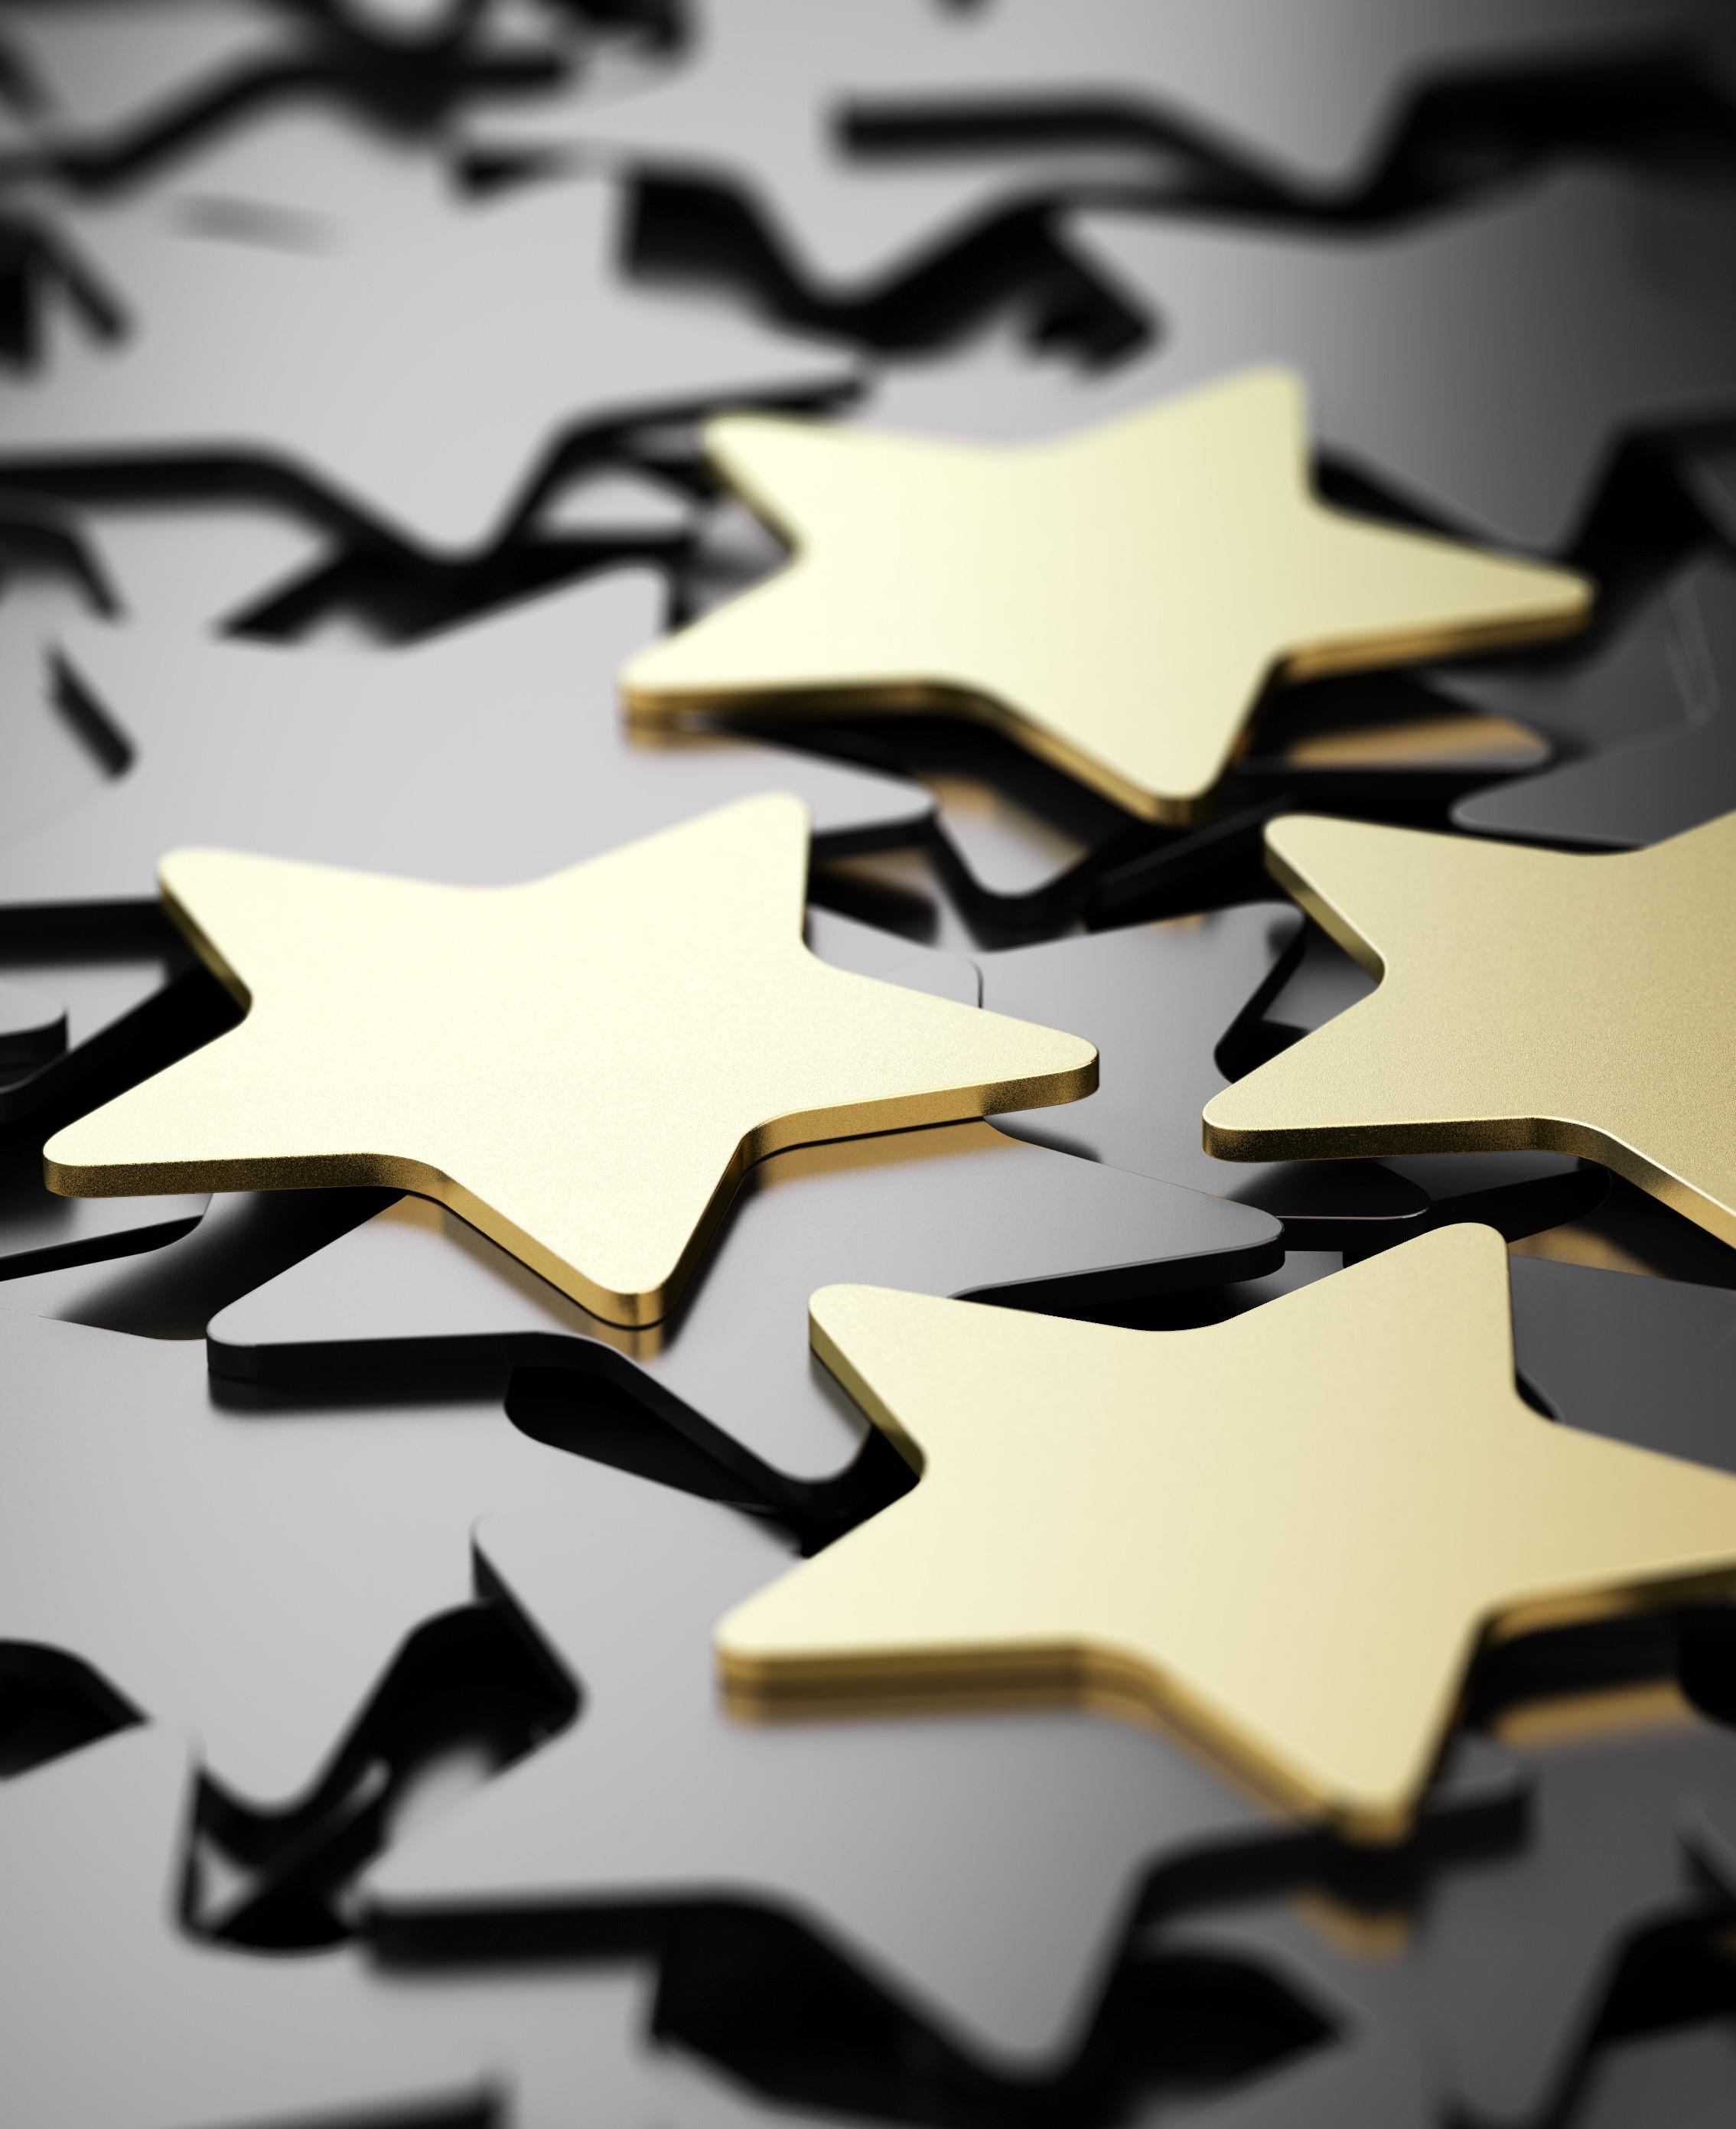 étoiles-or-notation